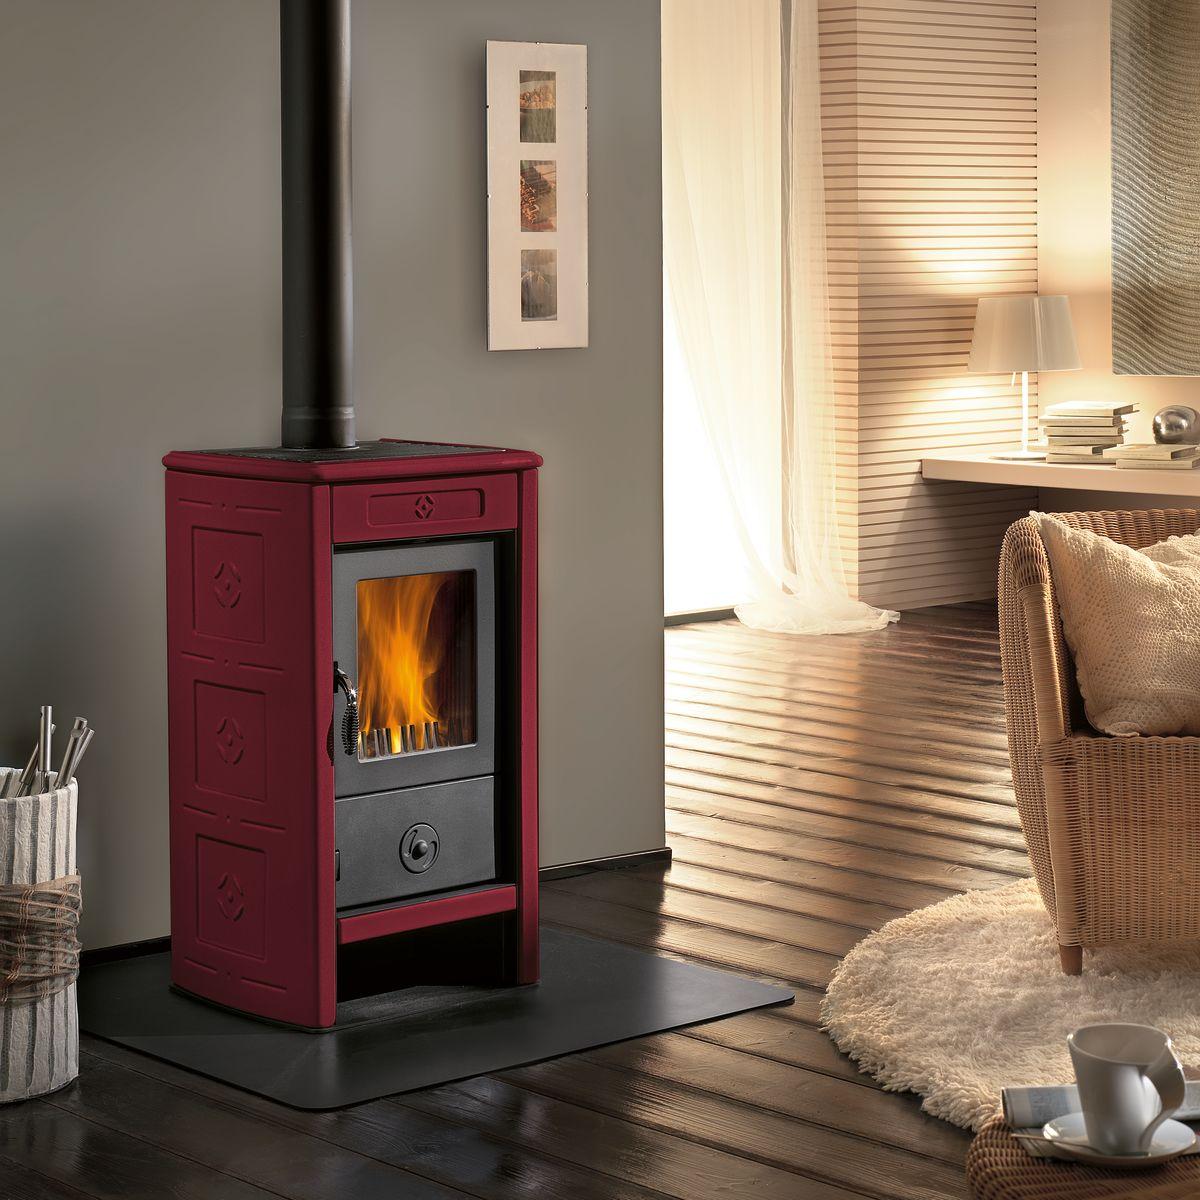 Stufa a legna per termosifoni cheap image with stufa a legna per termosifoni elegant lilia - Stufa a legna per termosifoni ...